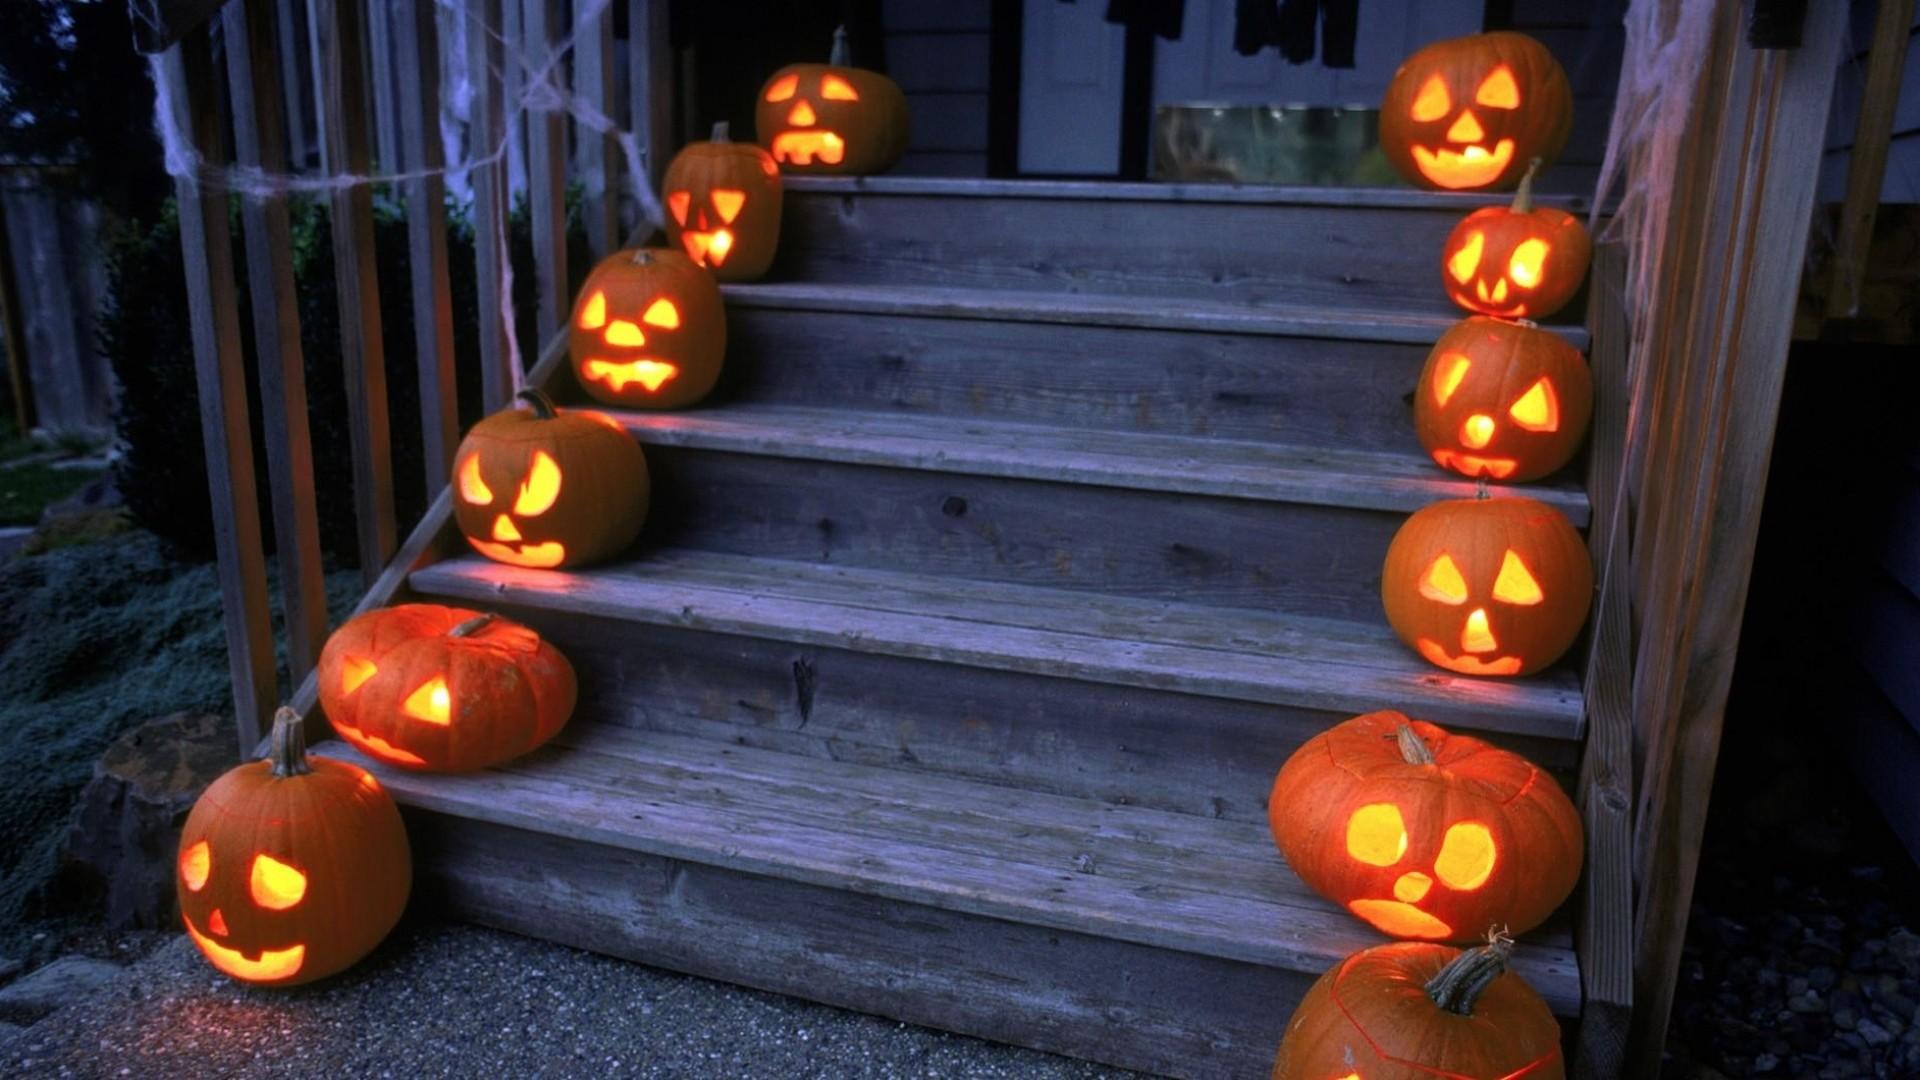 Wallpaper halloween, holiday, pumpkin, stairs, porch